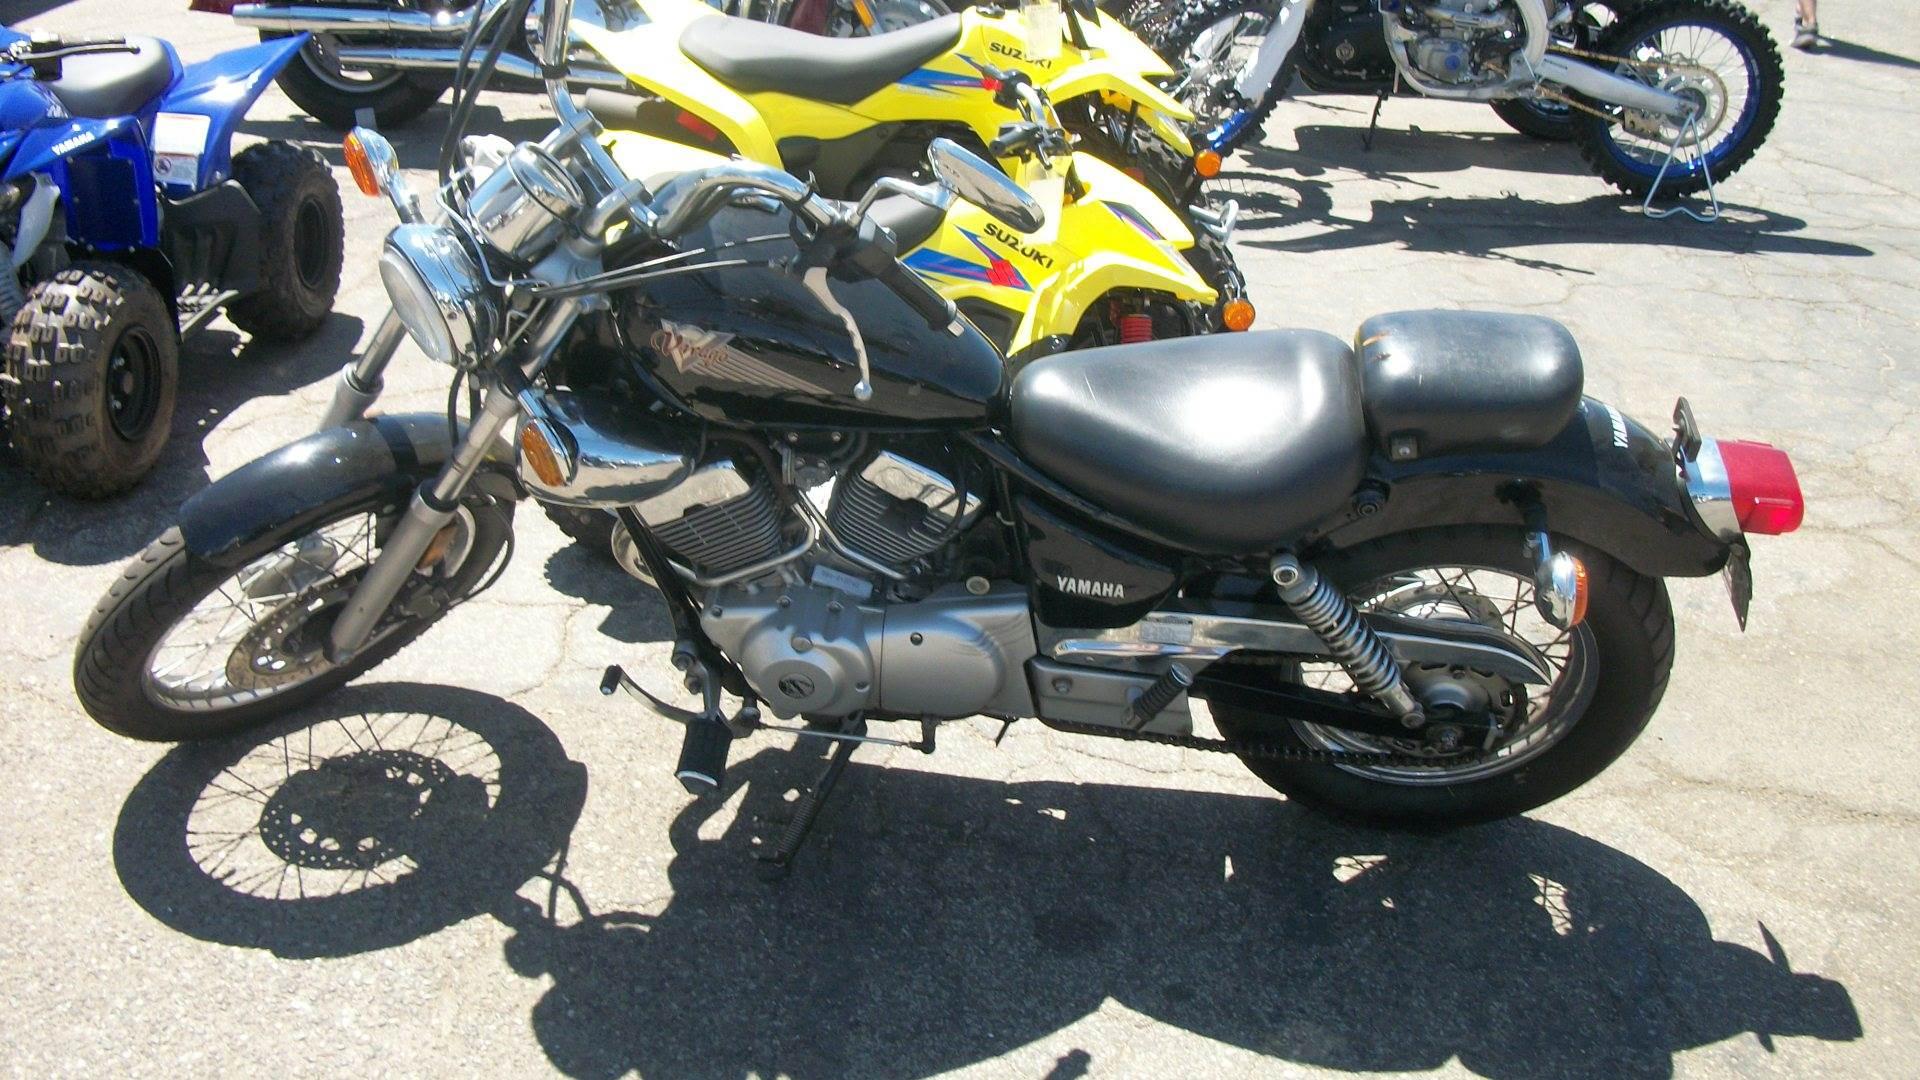 2005 Yamaha Virago 250 in Simi Valley, California